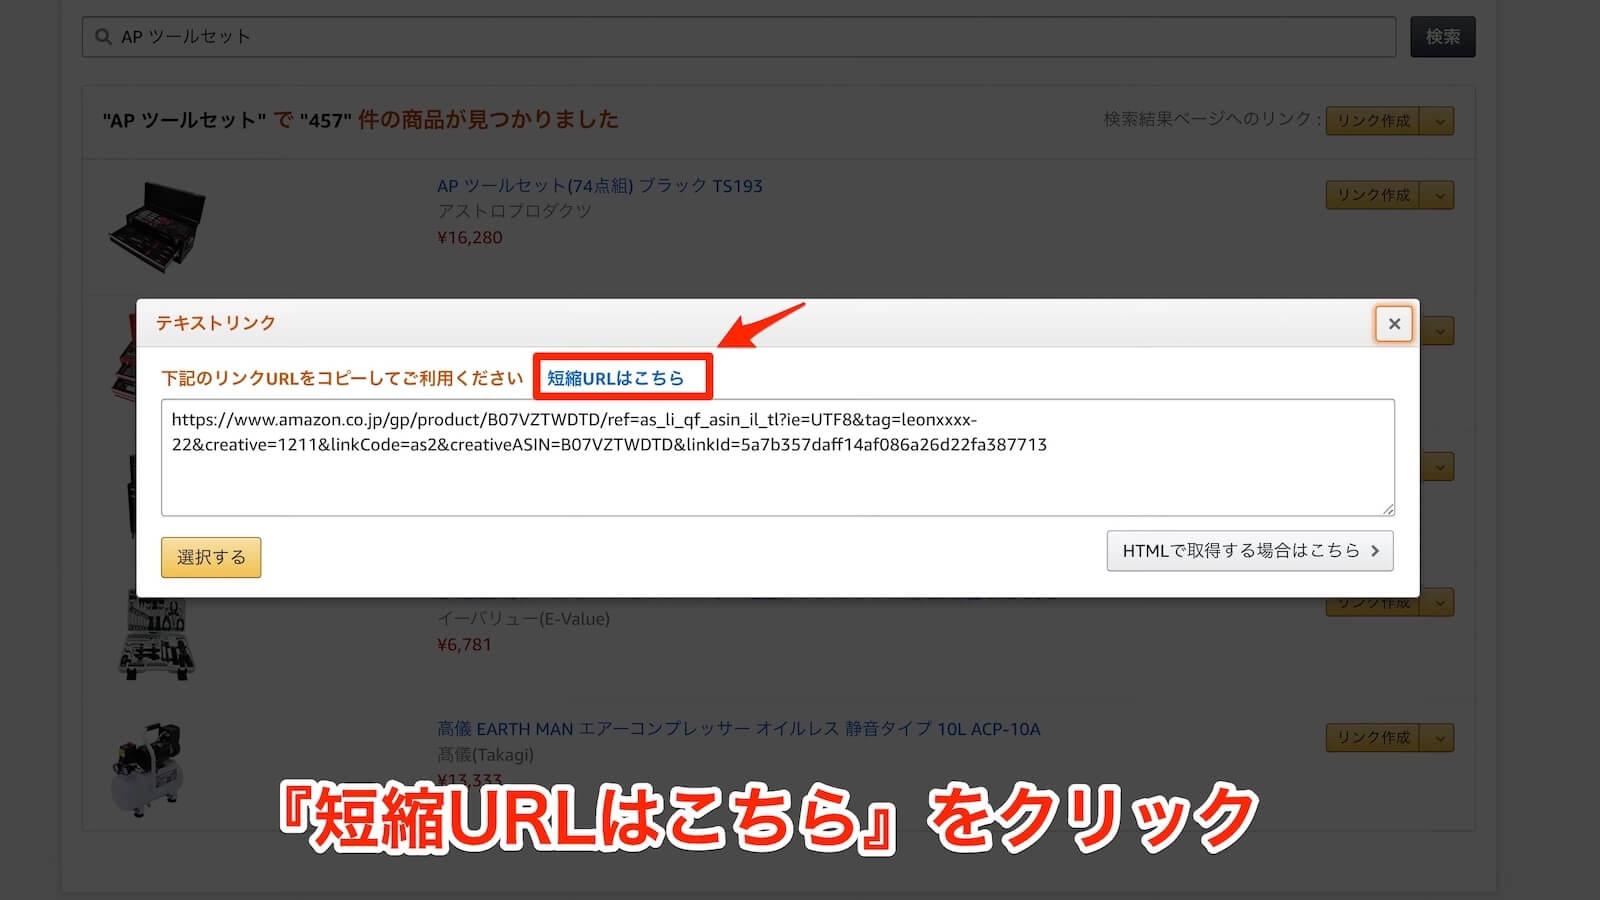 Amazon Associate product shortened URL creation screen capture